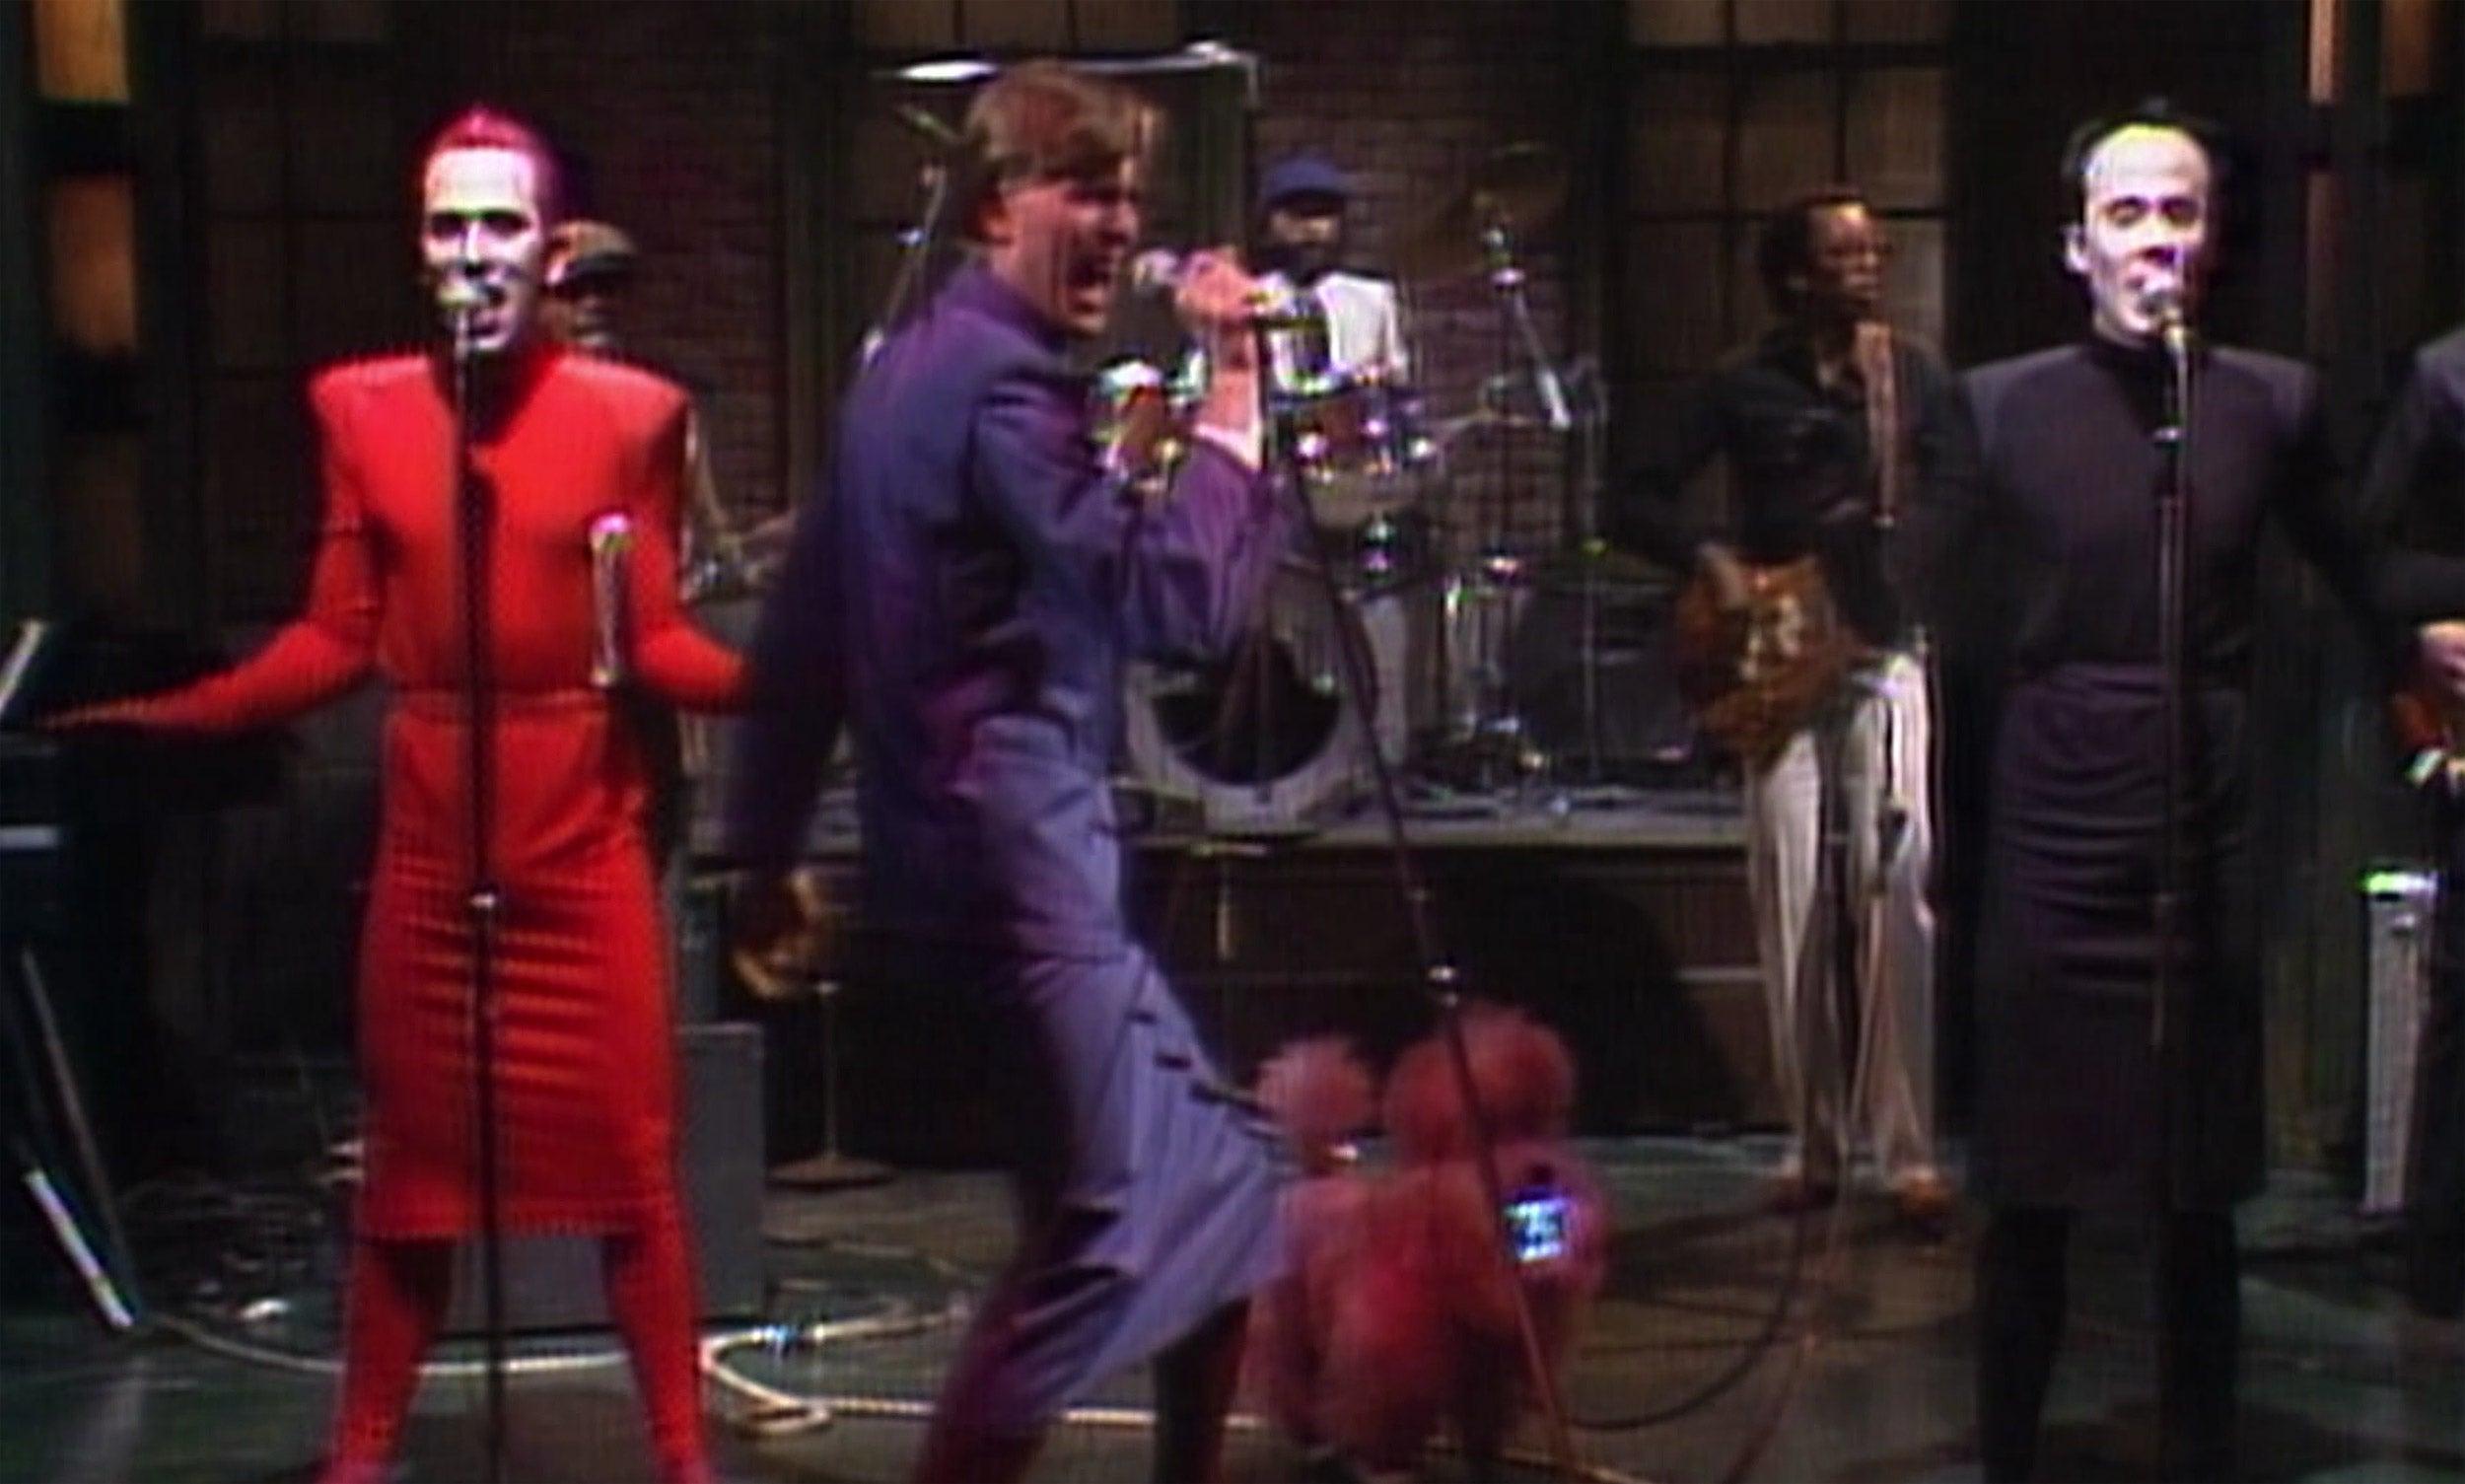 Joey Arias, David Bowie, Klaus Nomi perform on Saturday Night Live stage.